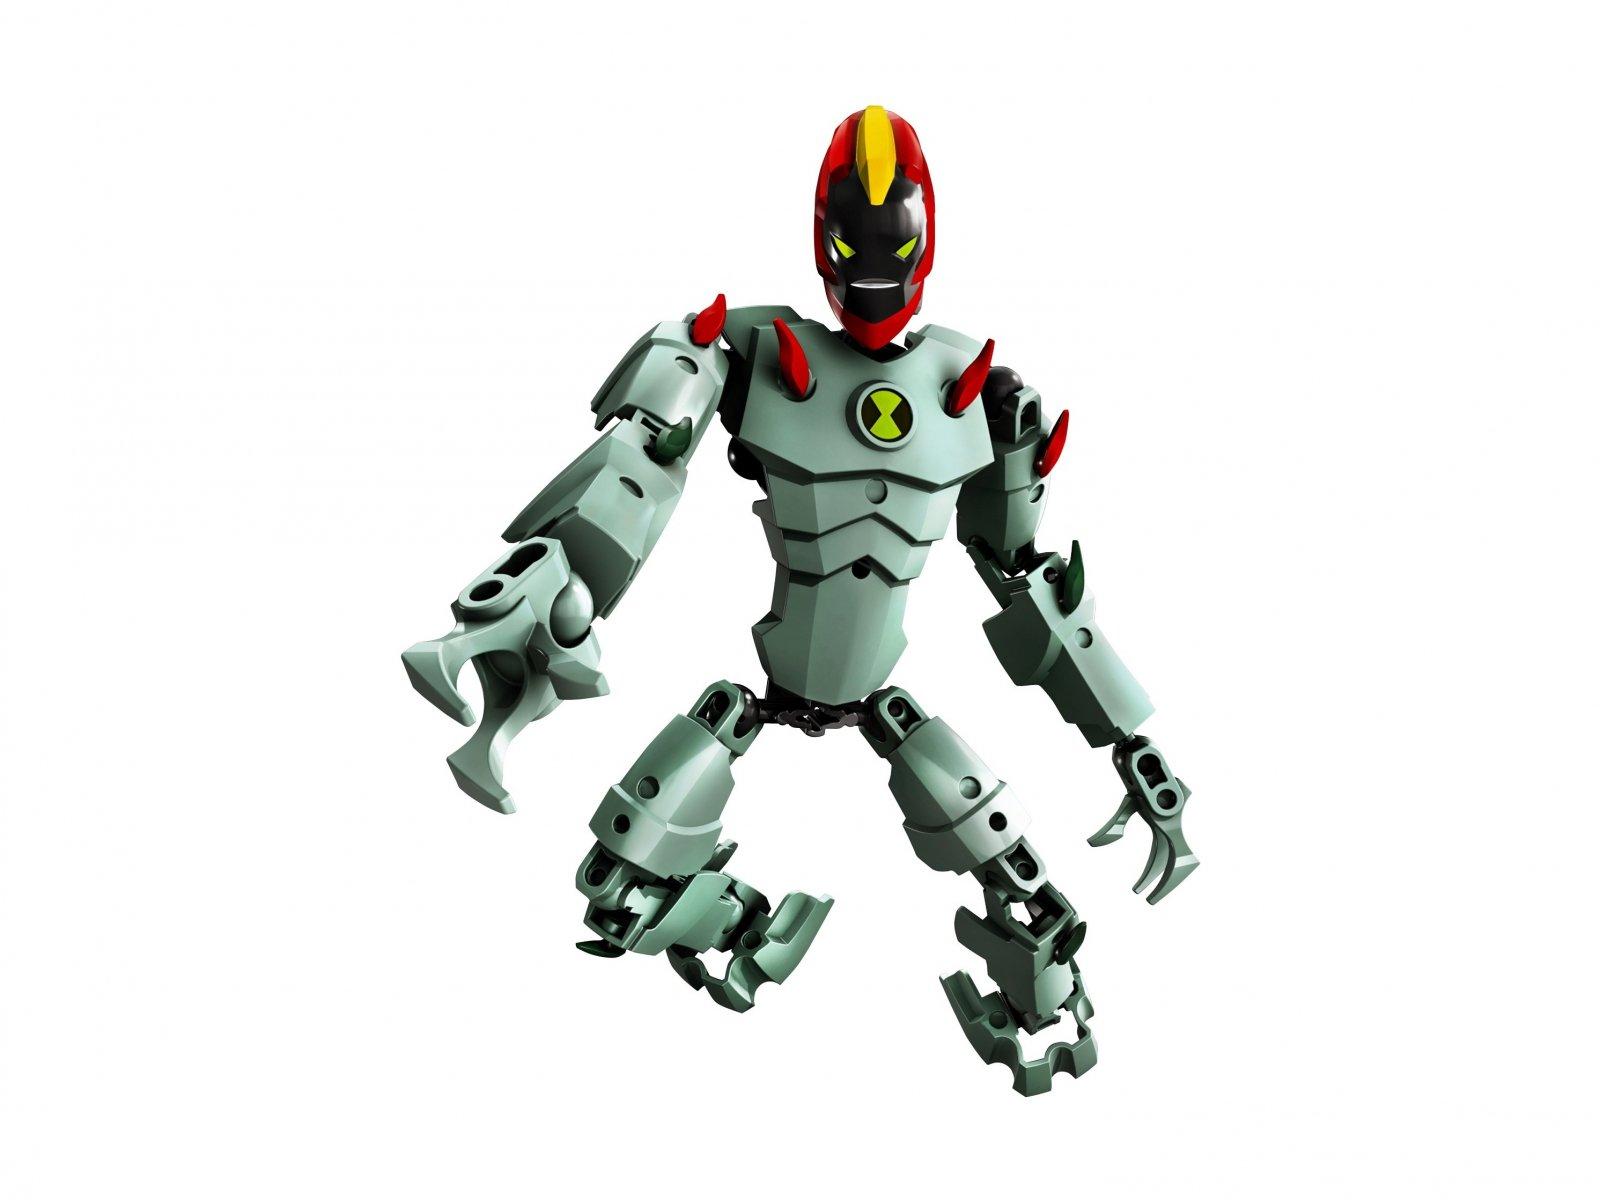 LEGO 8410 Ben 10 Alien Force™ Szlamfajer